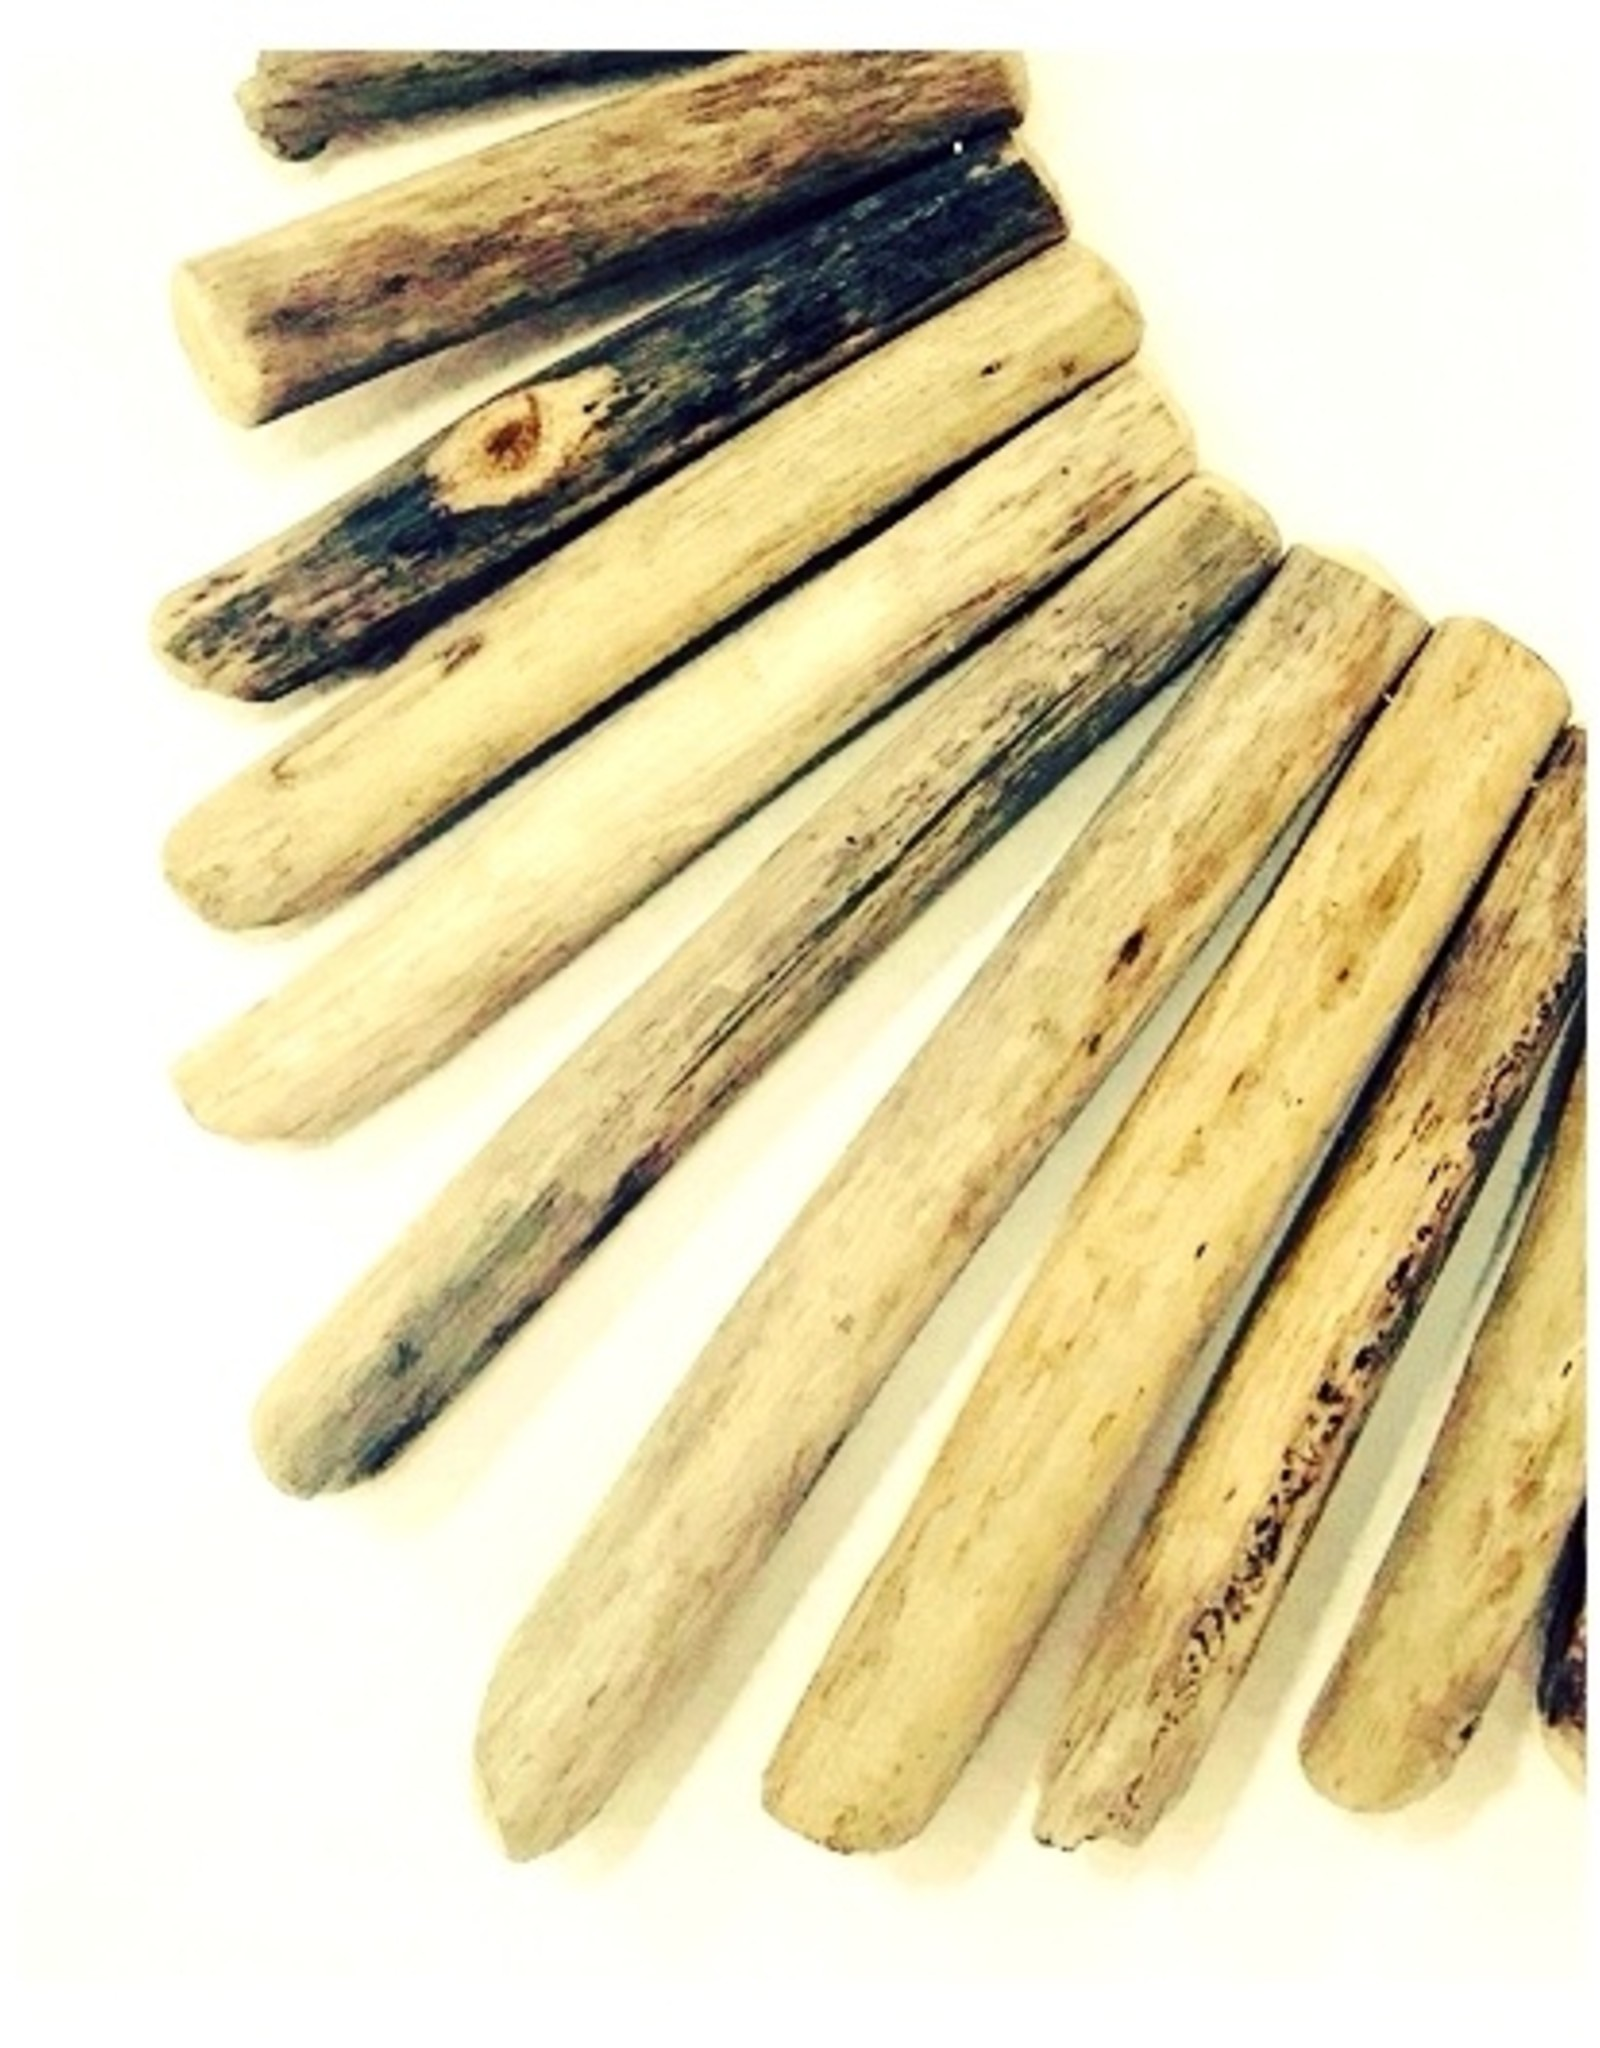 Wood Ketting